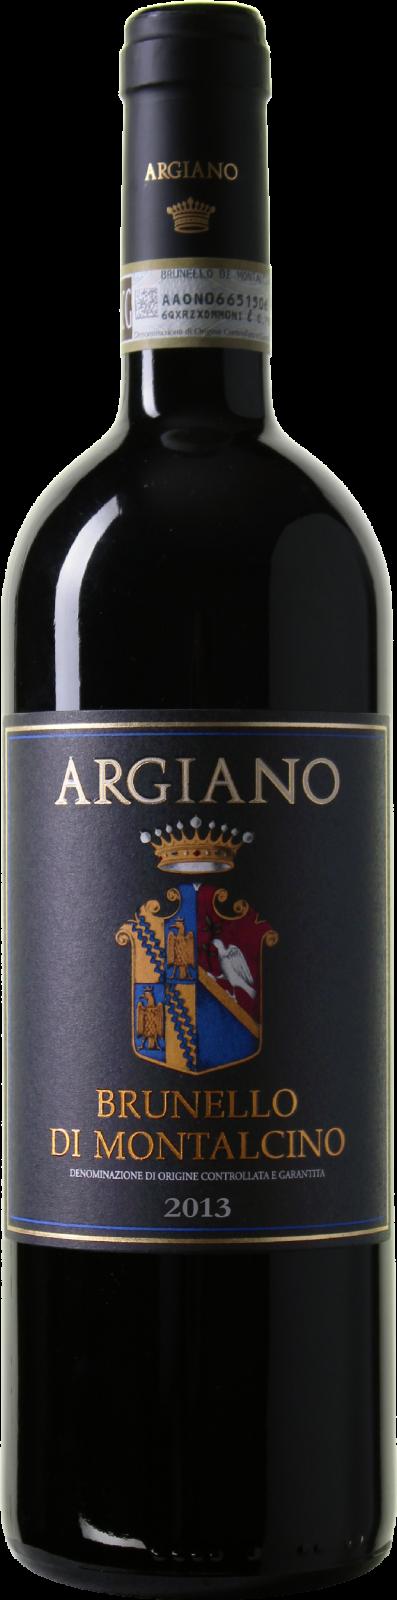 Argiano Brunello di Montalcino wijnbeurs.nl